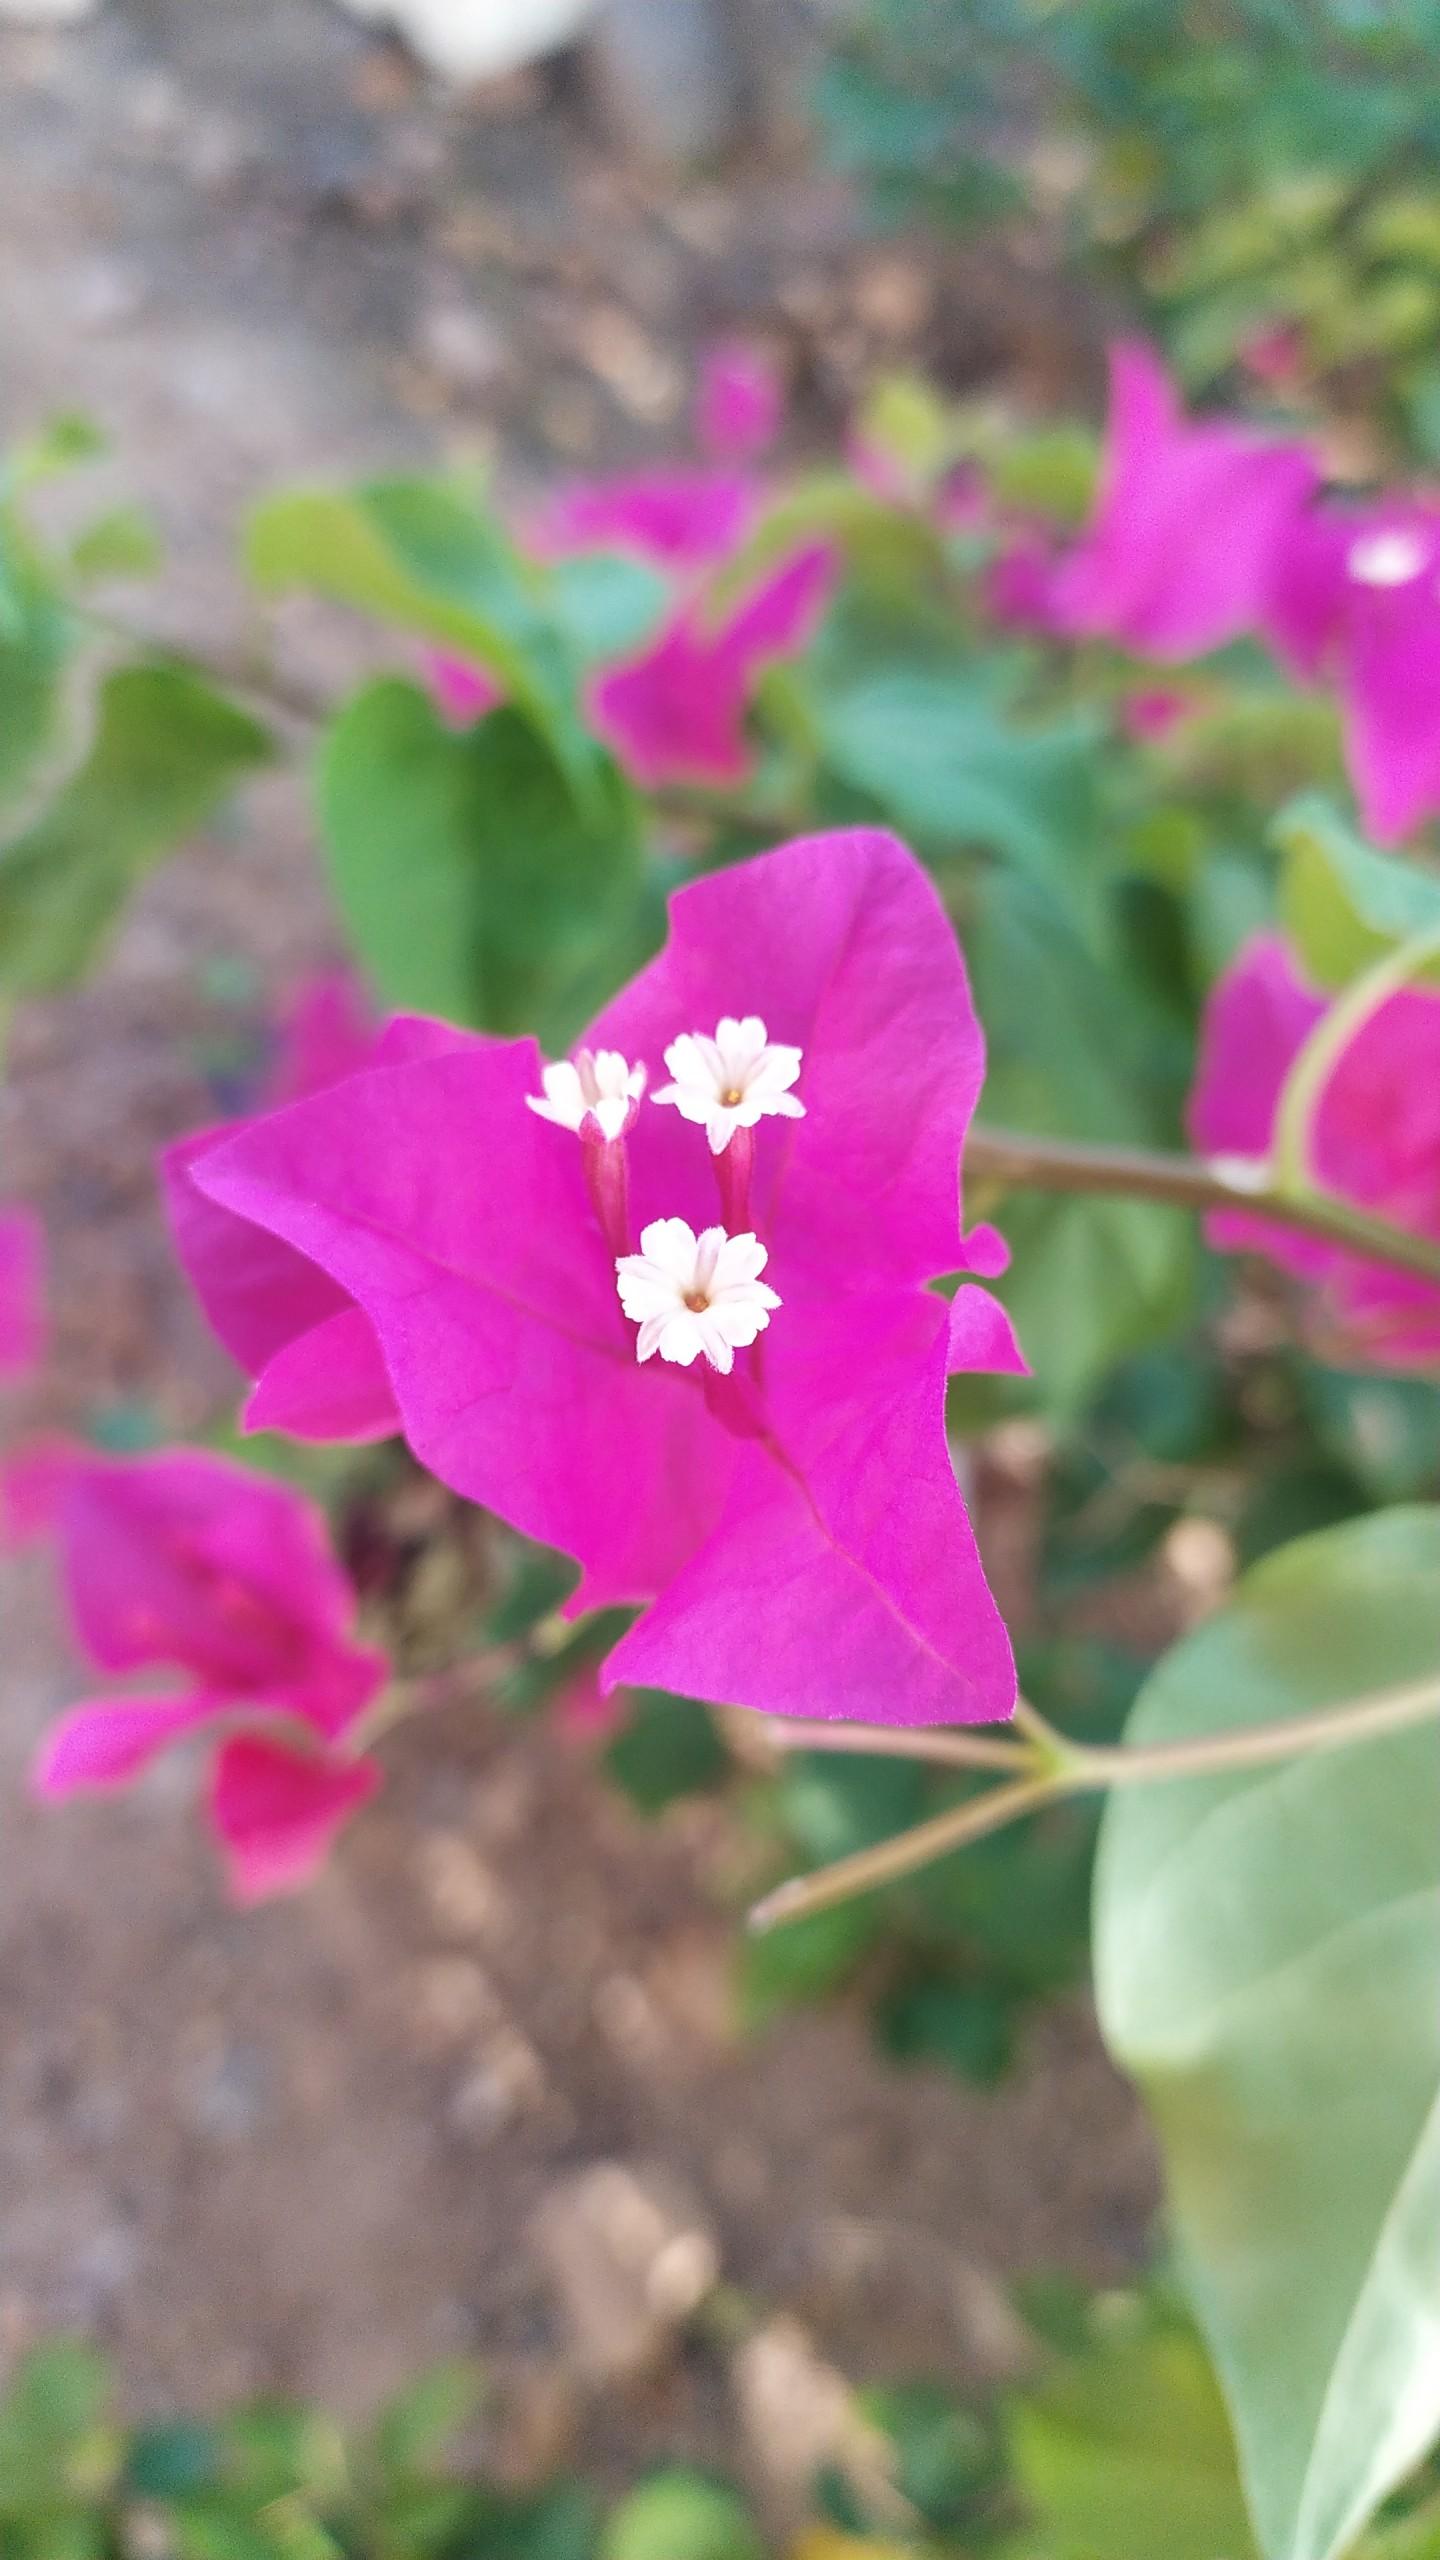 bougainvillea flower white buds